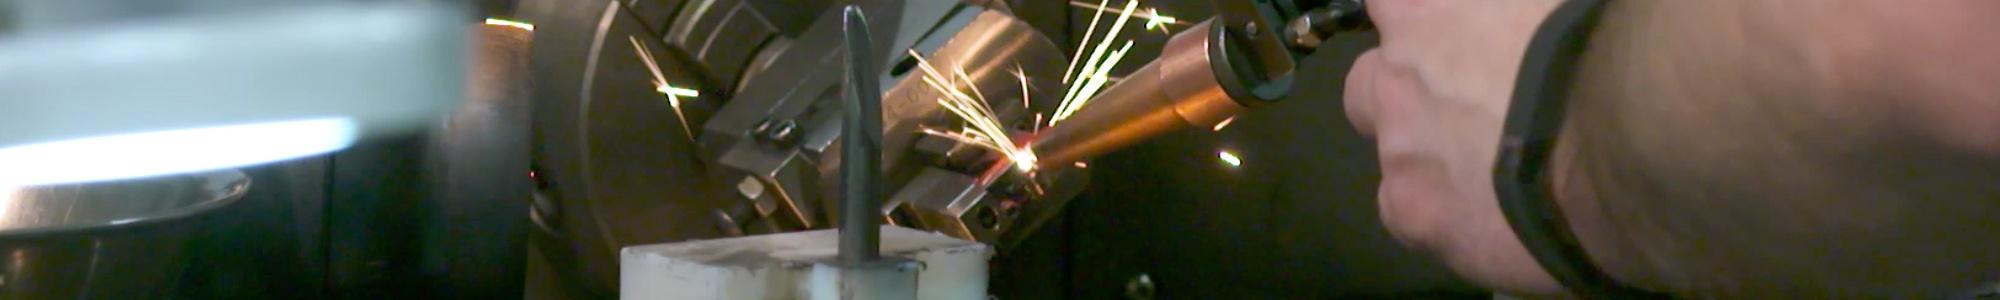 laser-welding-3.jpg